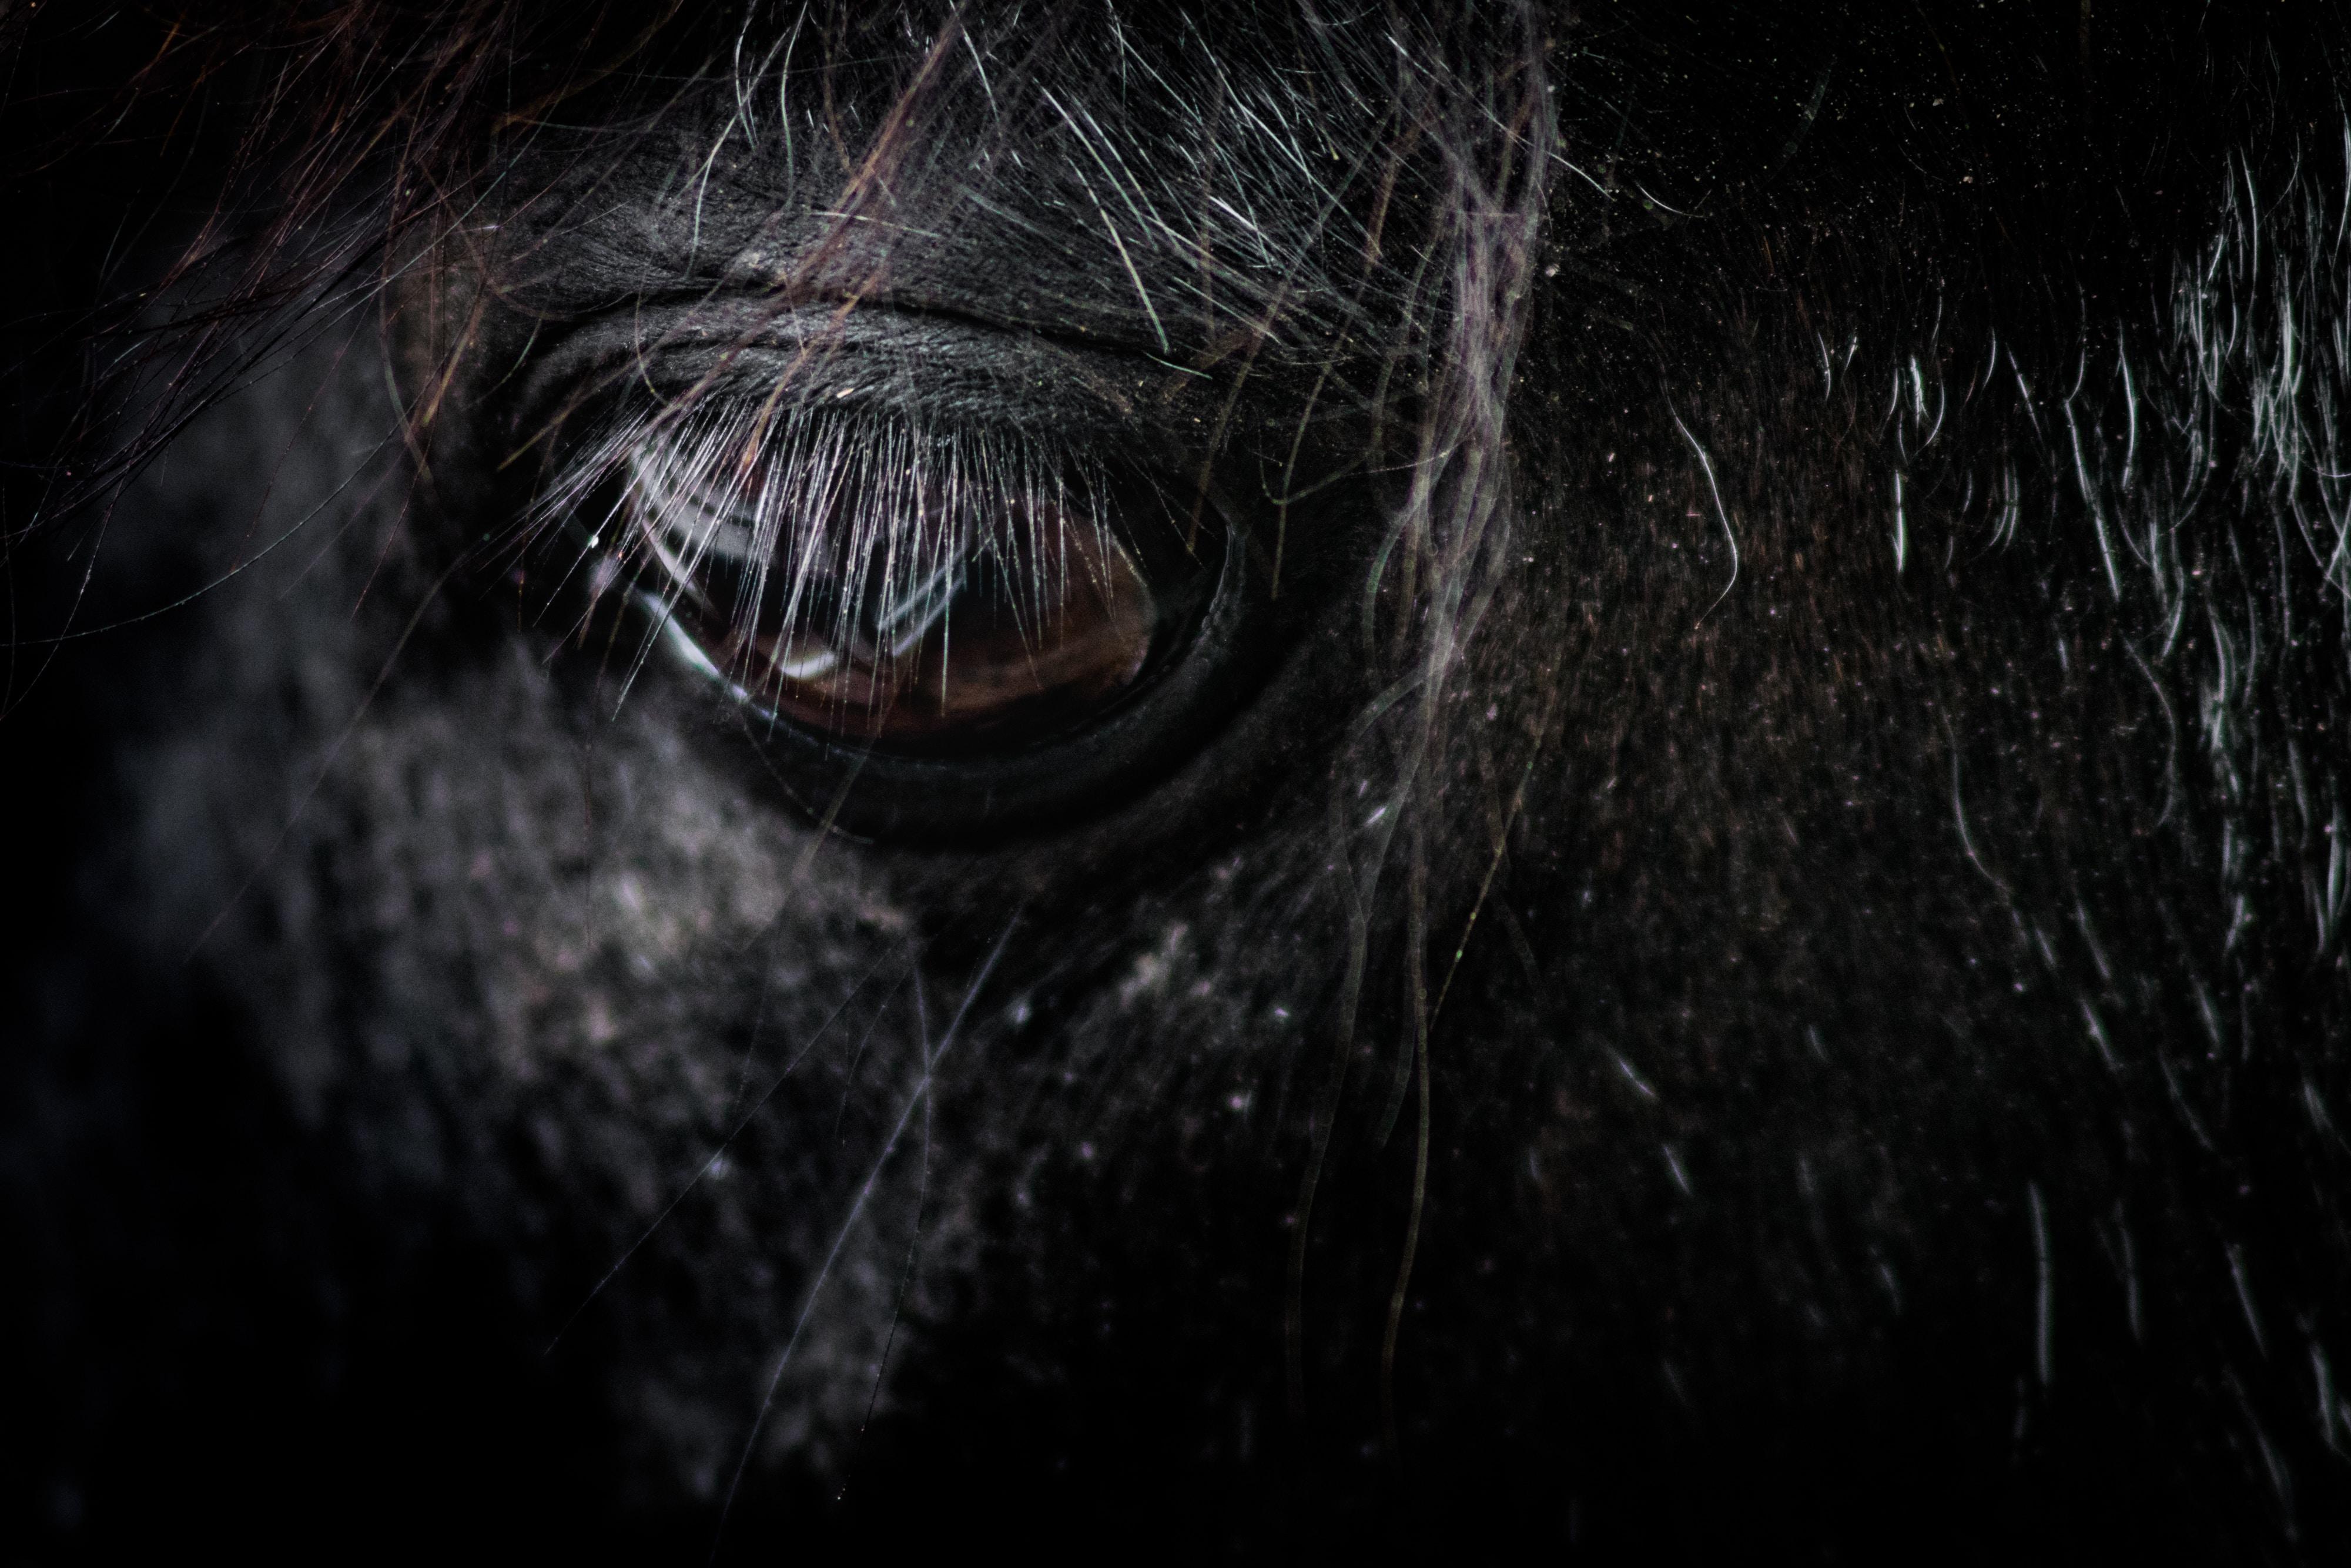 black horse eye